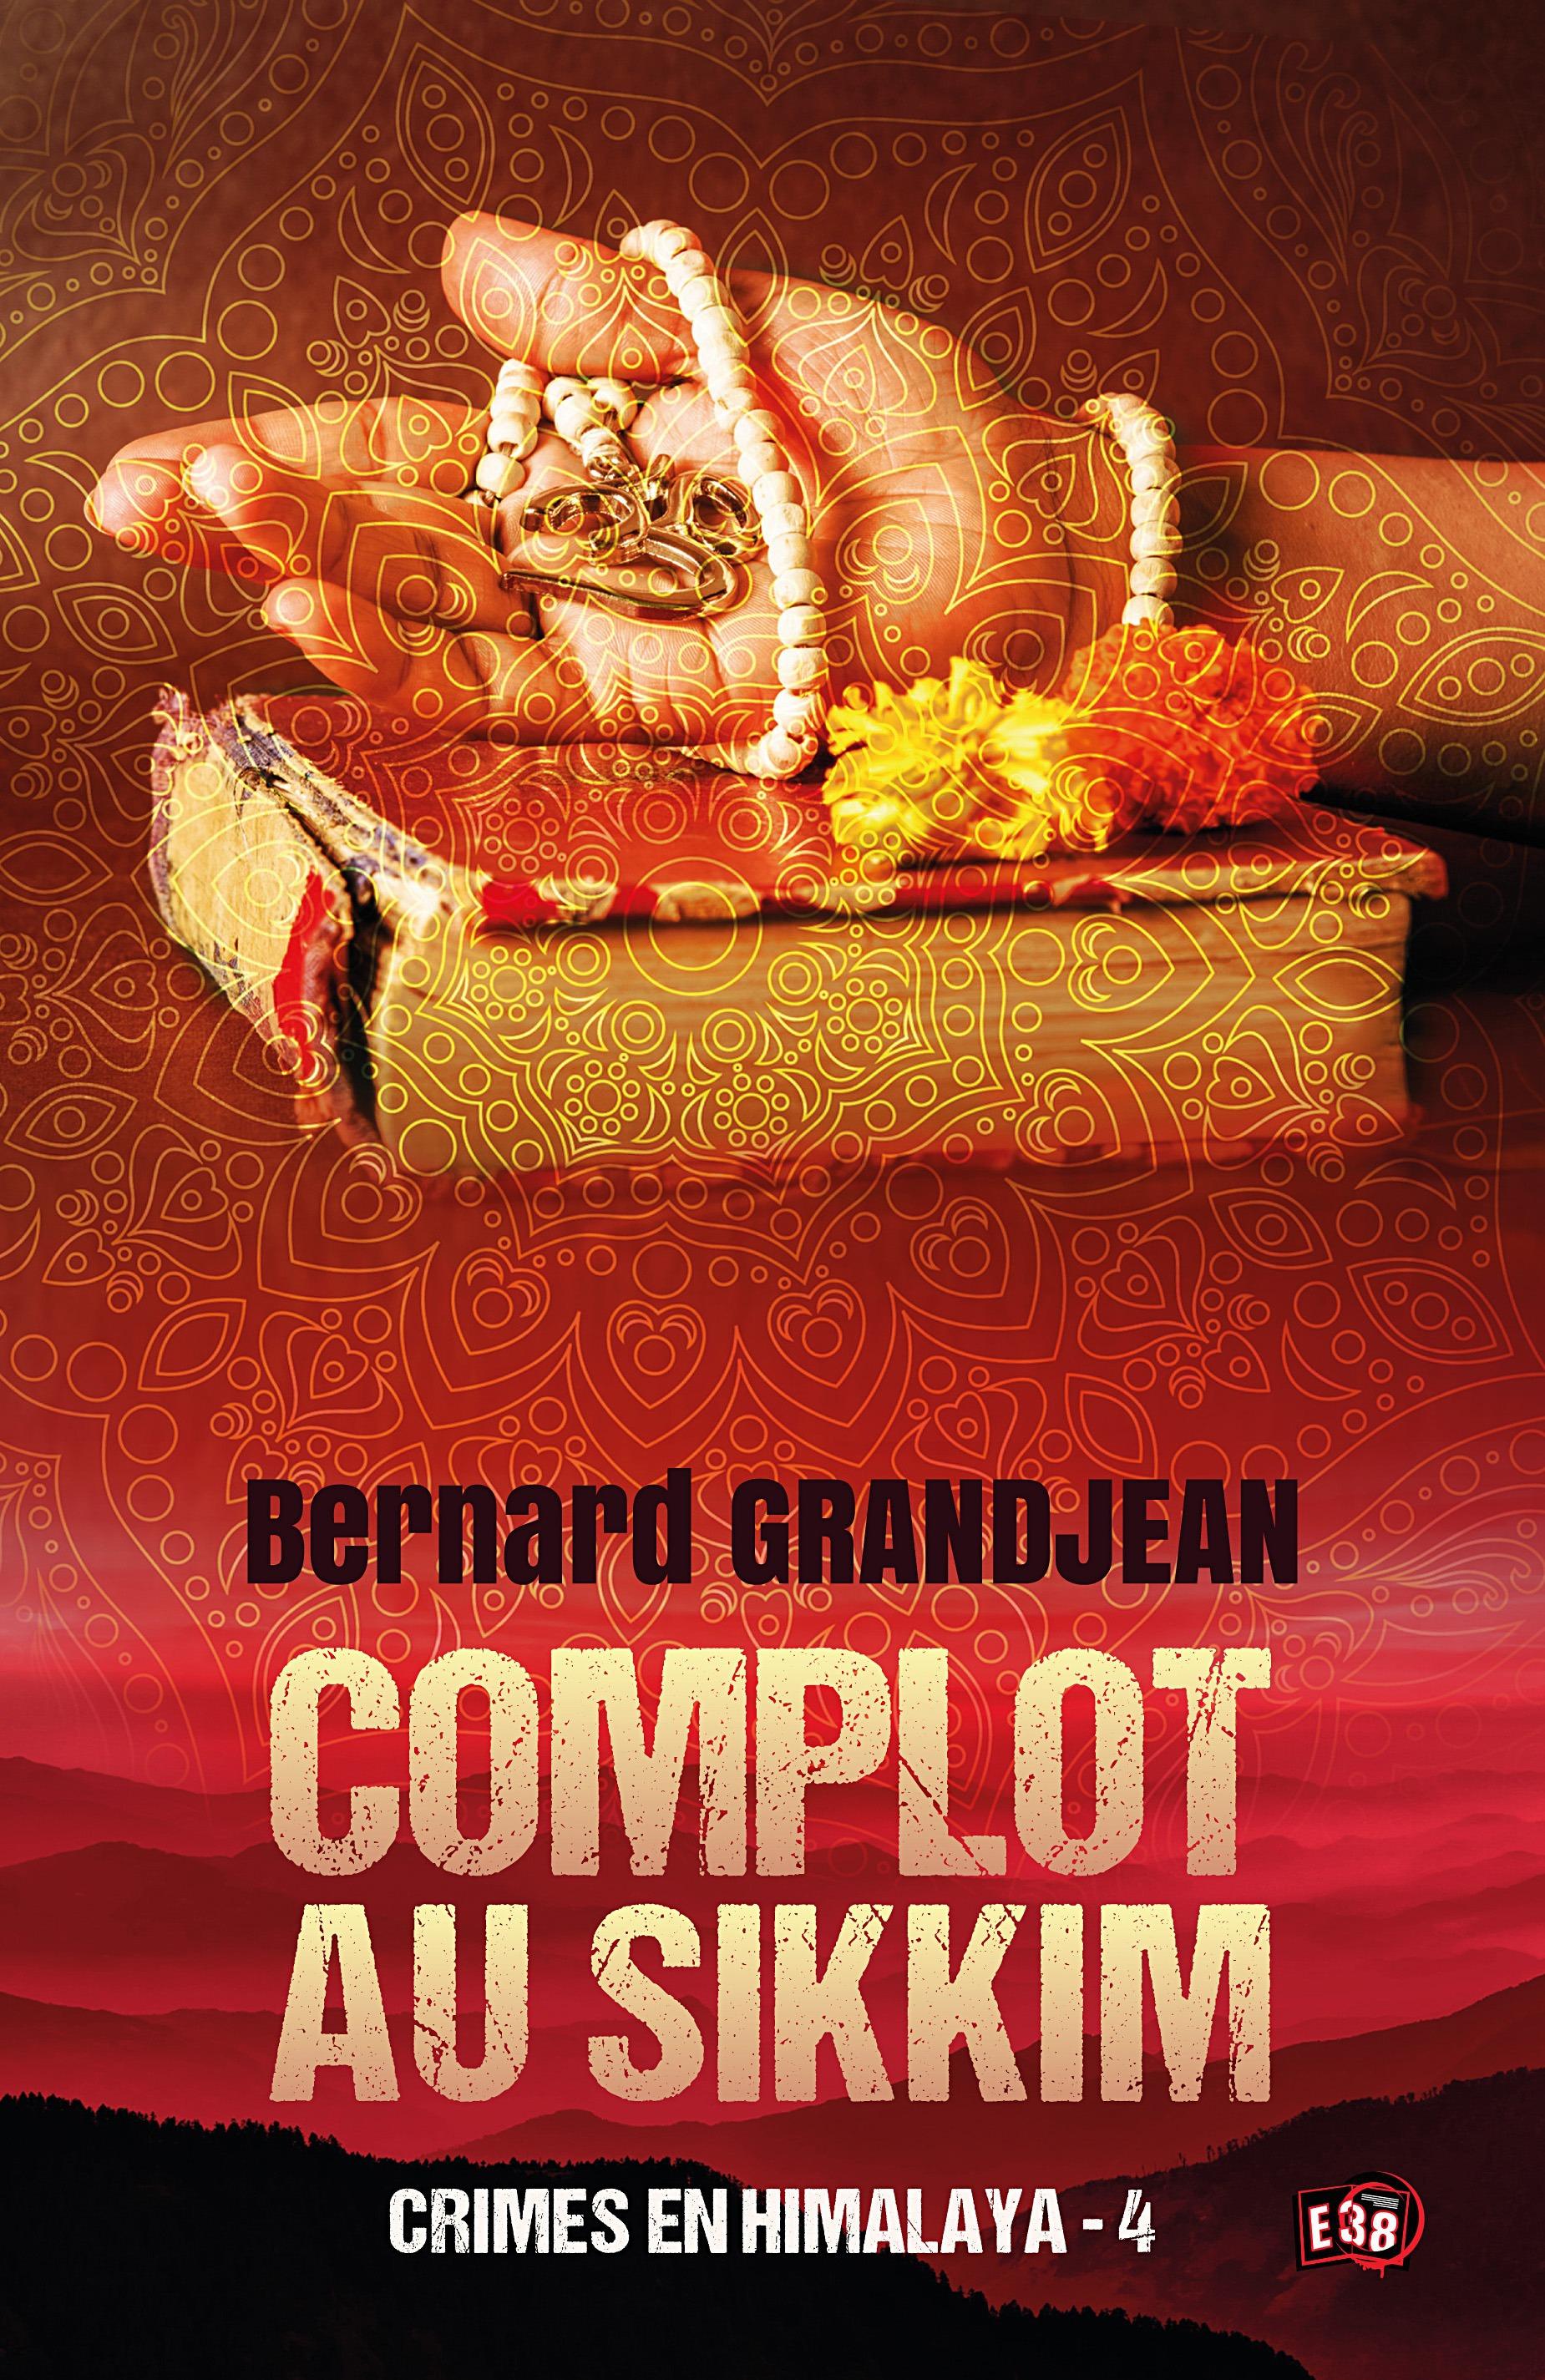 Complot au sikkim - crimes en himalaya 4